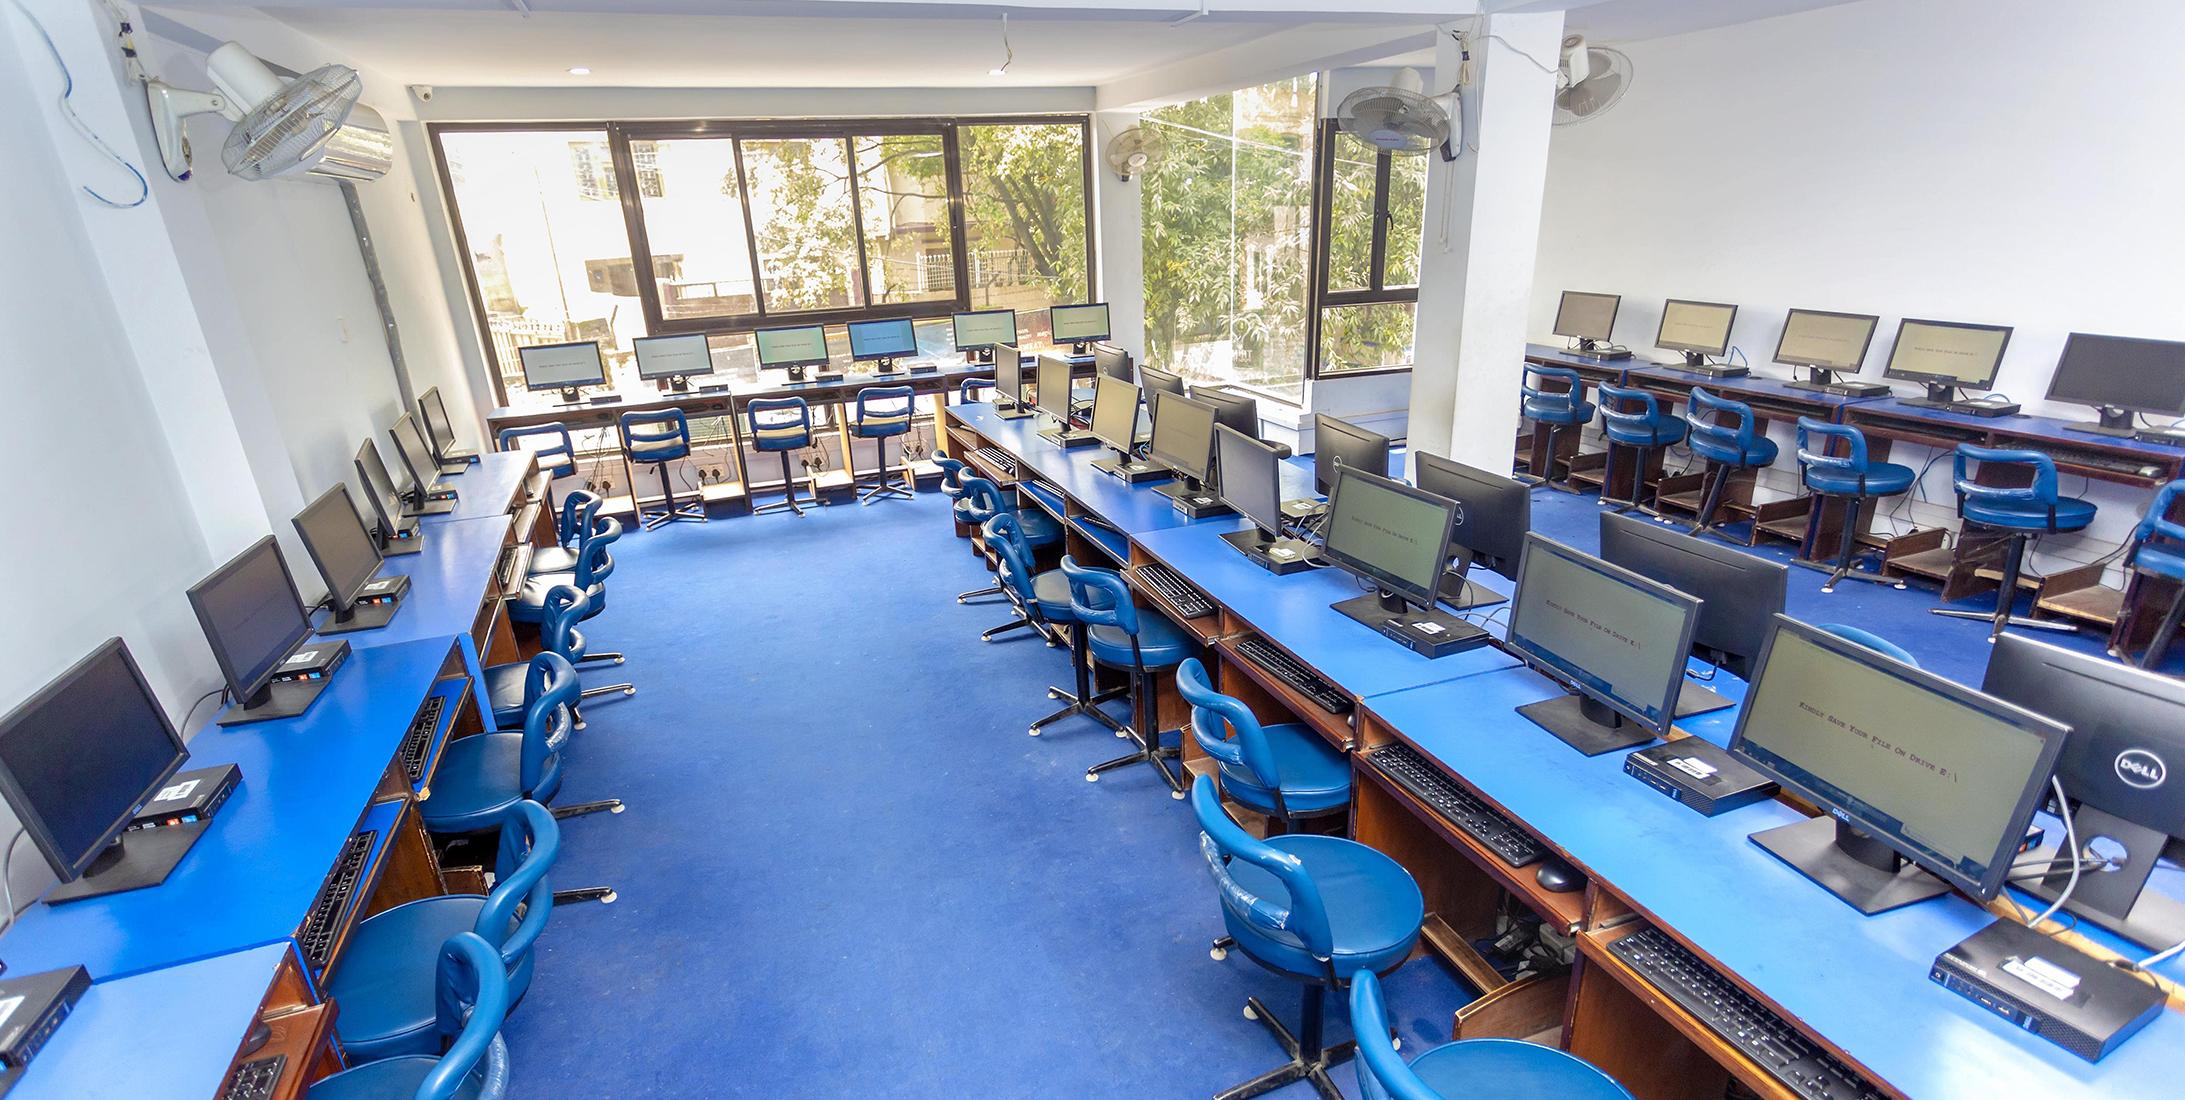 iims-facilities-slider-image